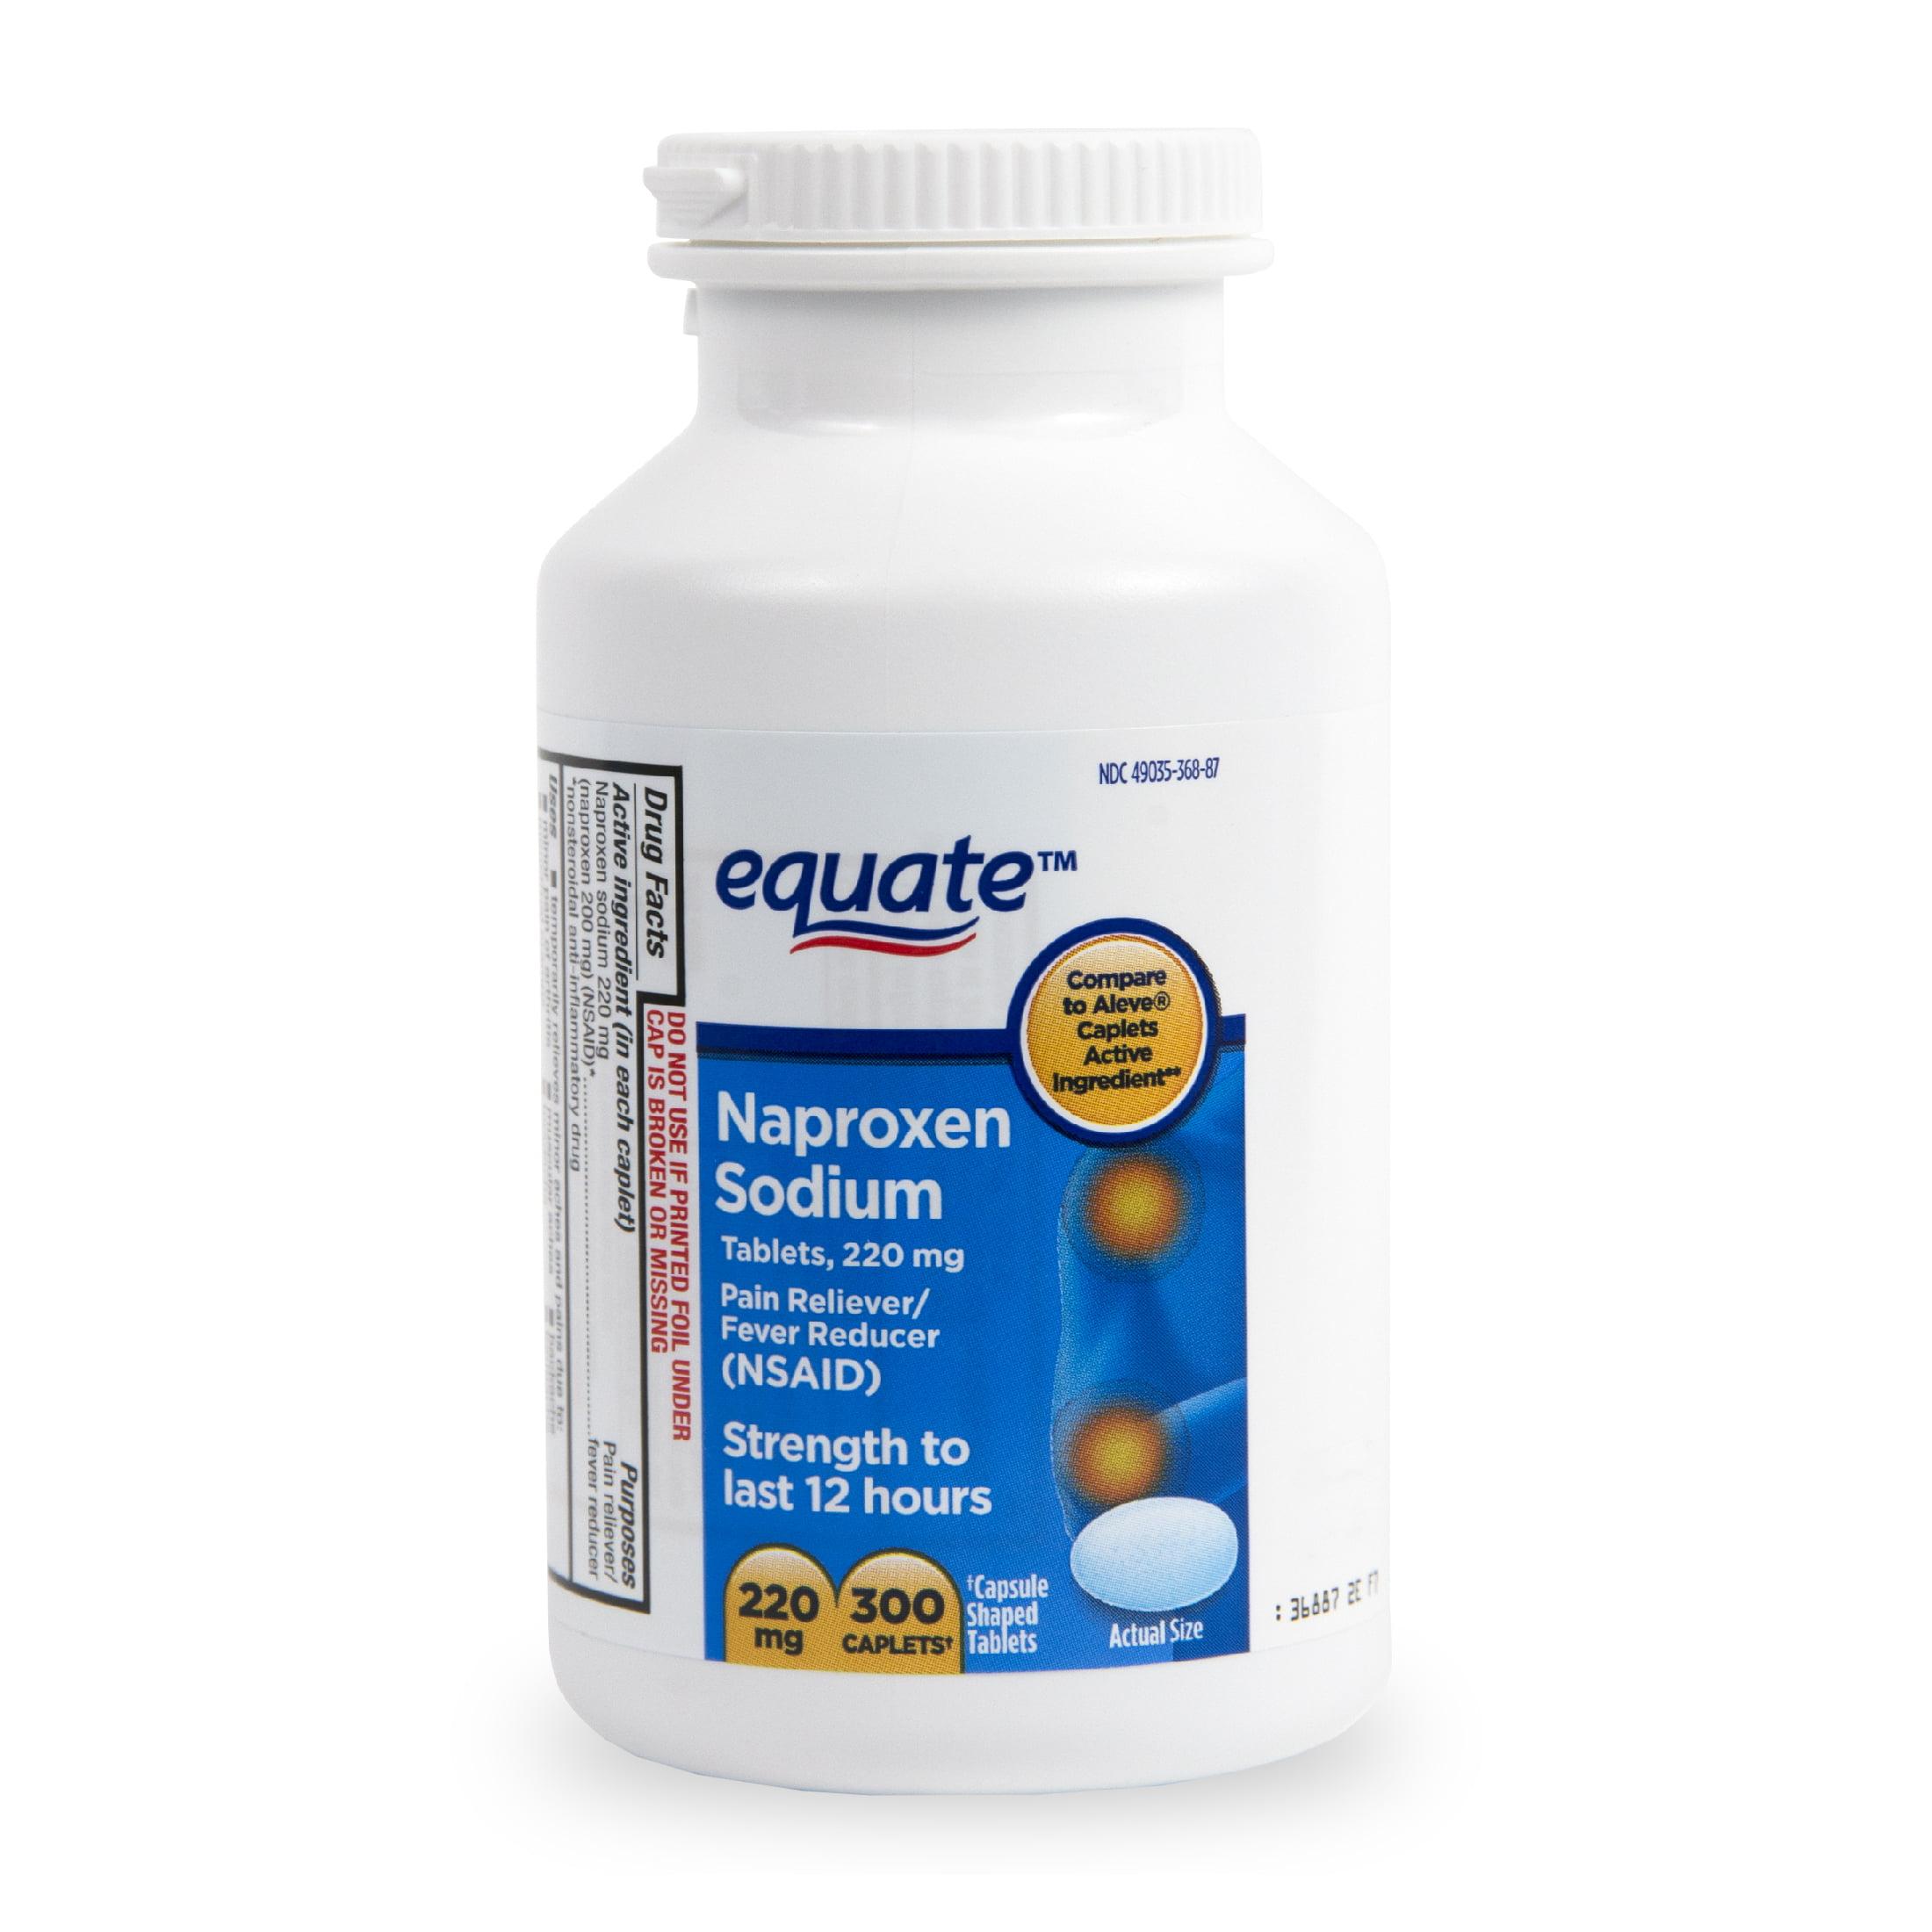 Equate Pain Relief Naproxen Sodium Caplets 220 Mg 300 Ct Walmartcom